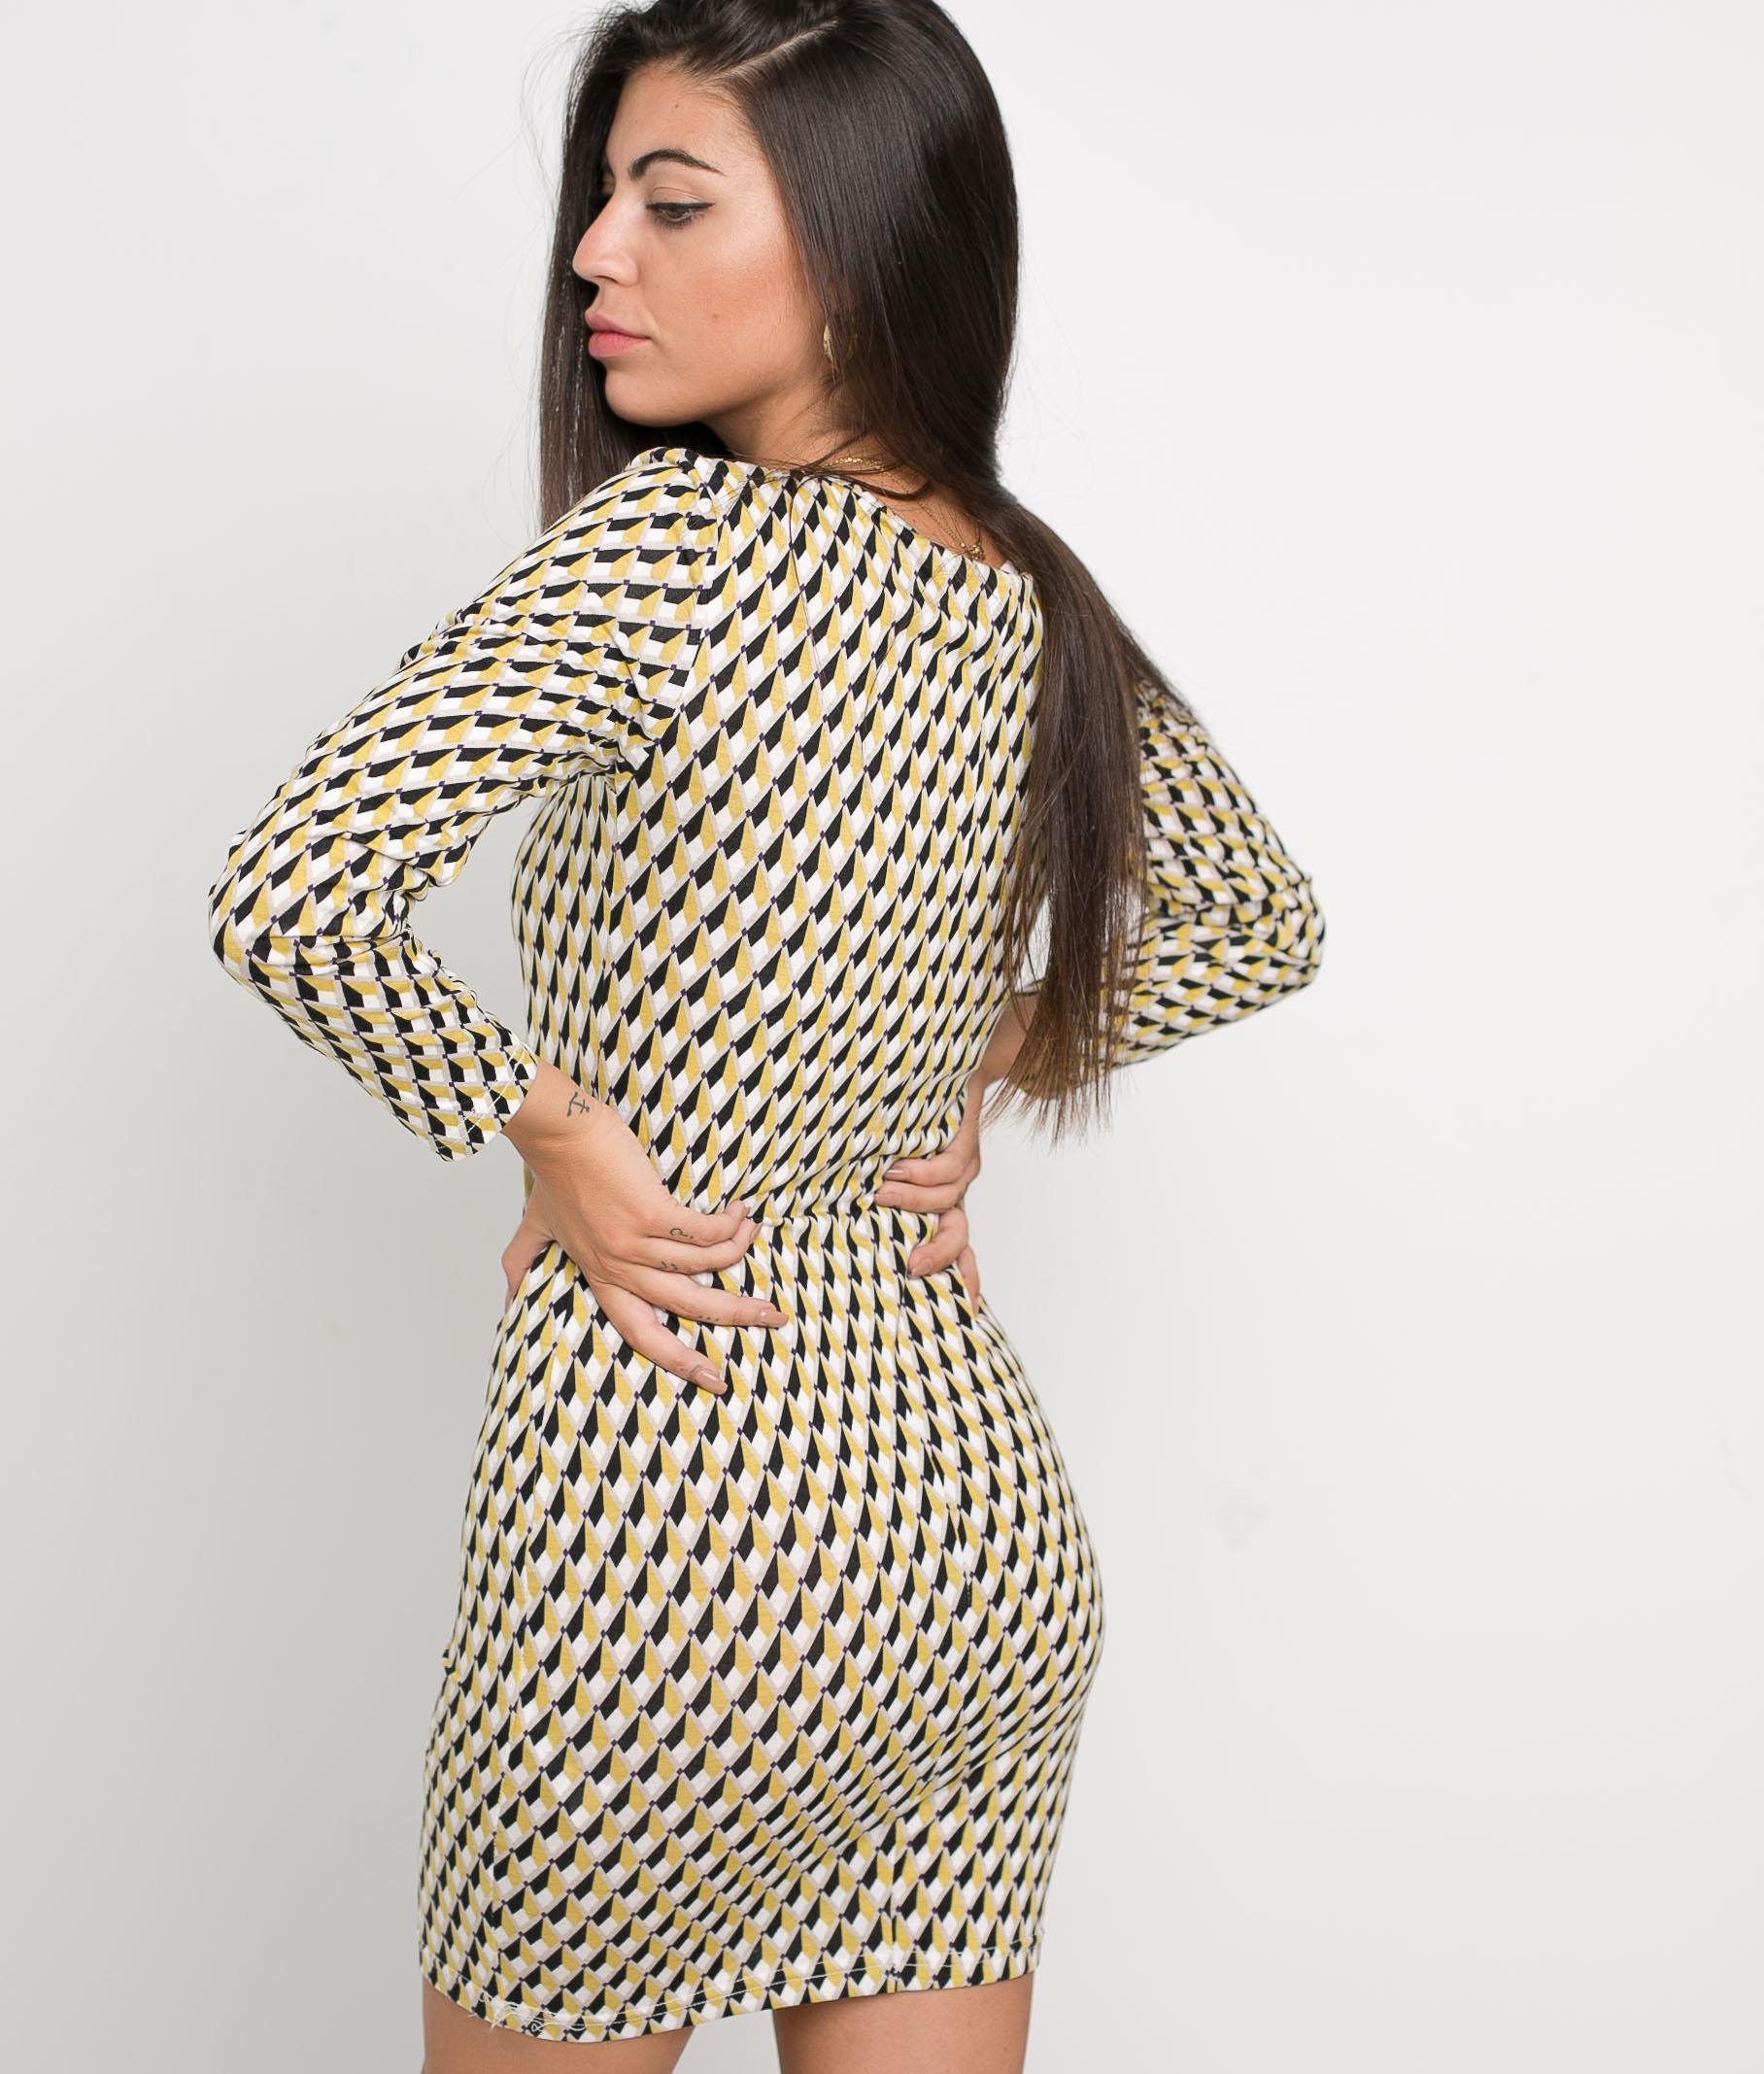 DRESS TRILA - YELLOW